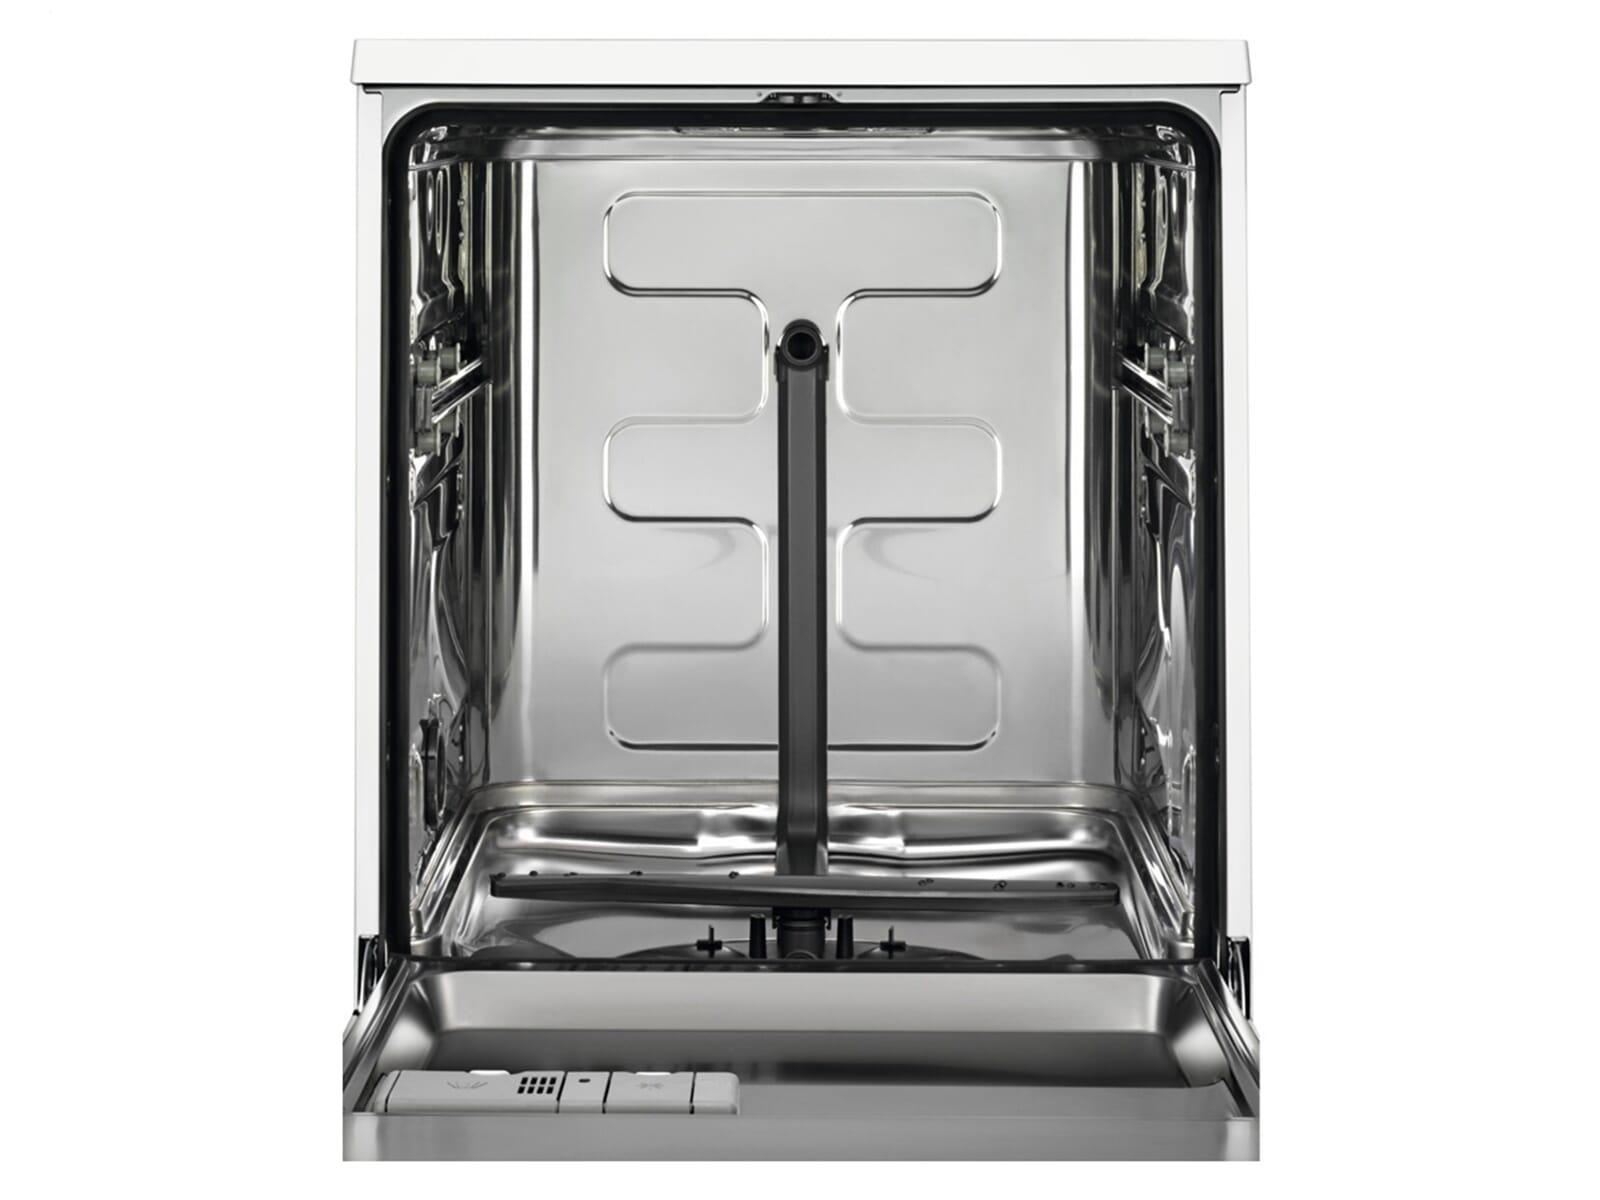 Aeg Kühlschrank Klopft : Aeg fsb z vollintegrierbarer einbaugeschirrspüler